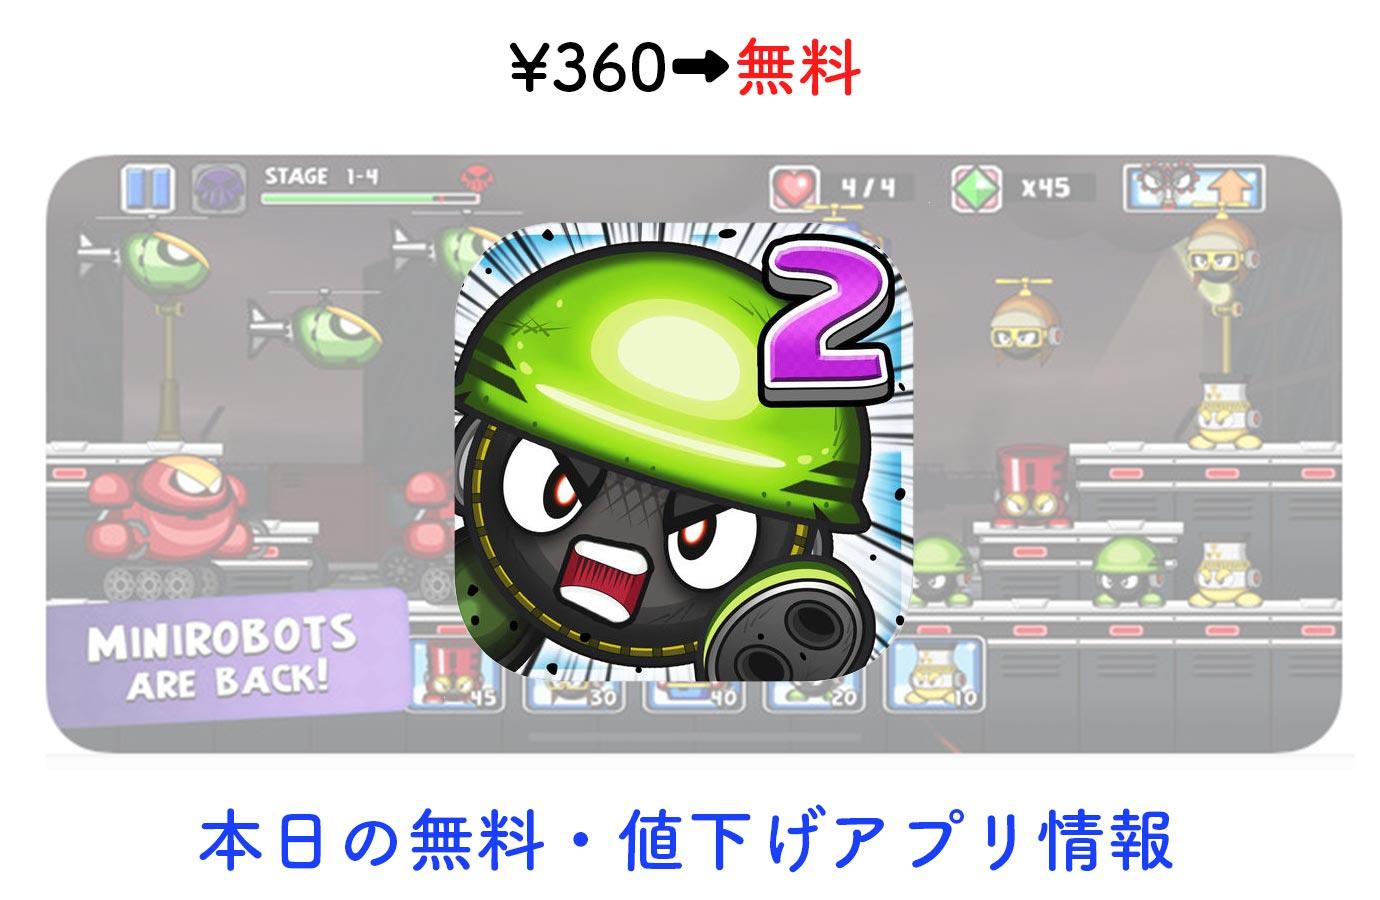 Appsale0525